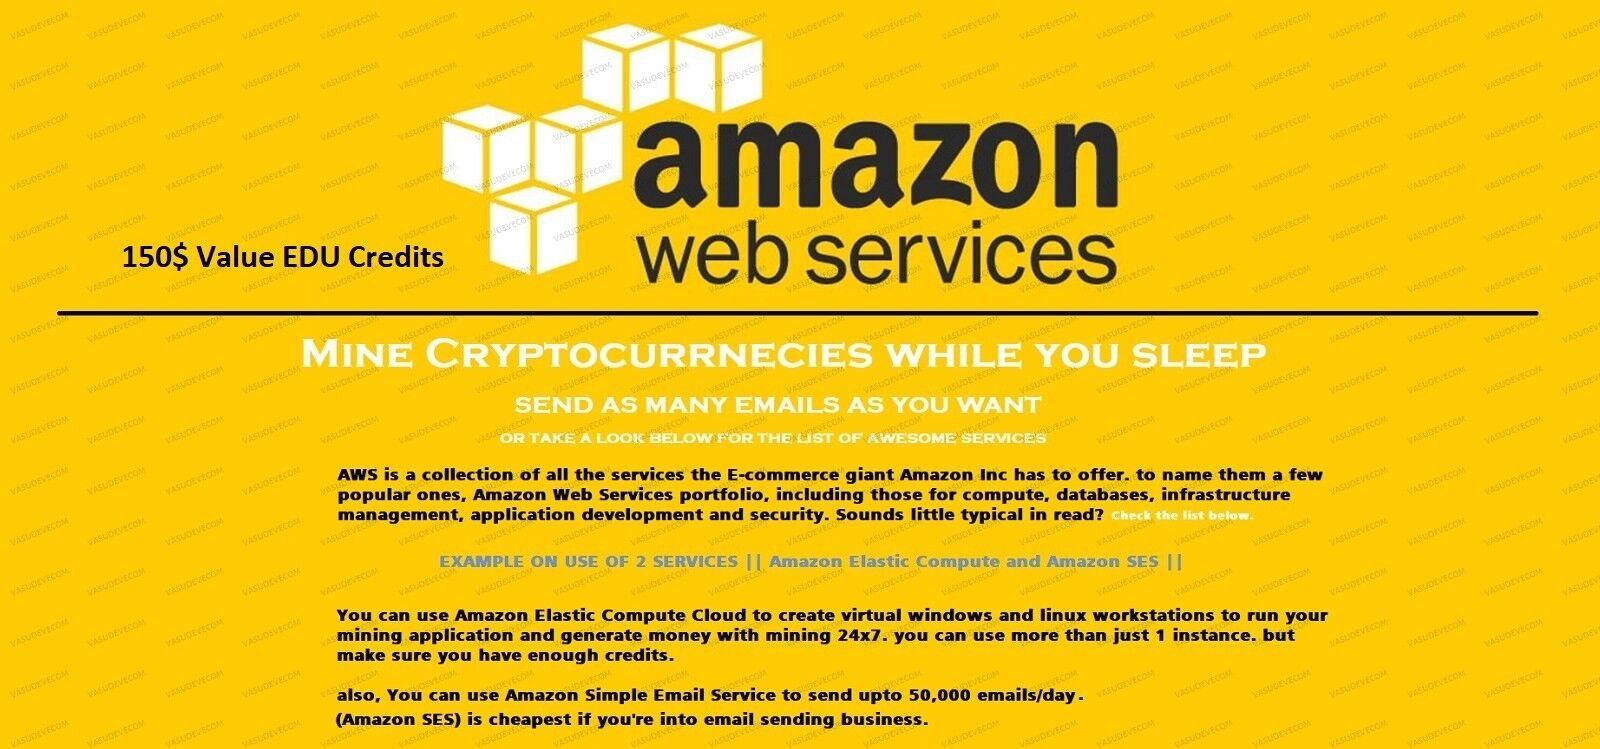 $150 aws credits amazon web services credit EC2 SQS RDS promocode